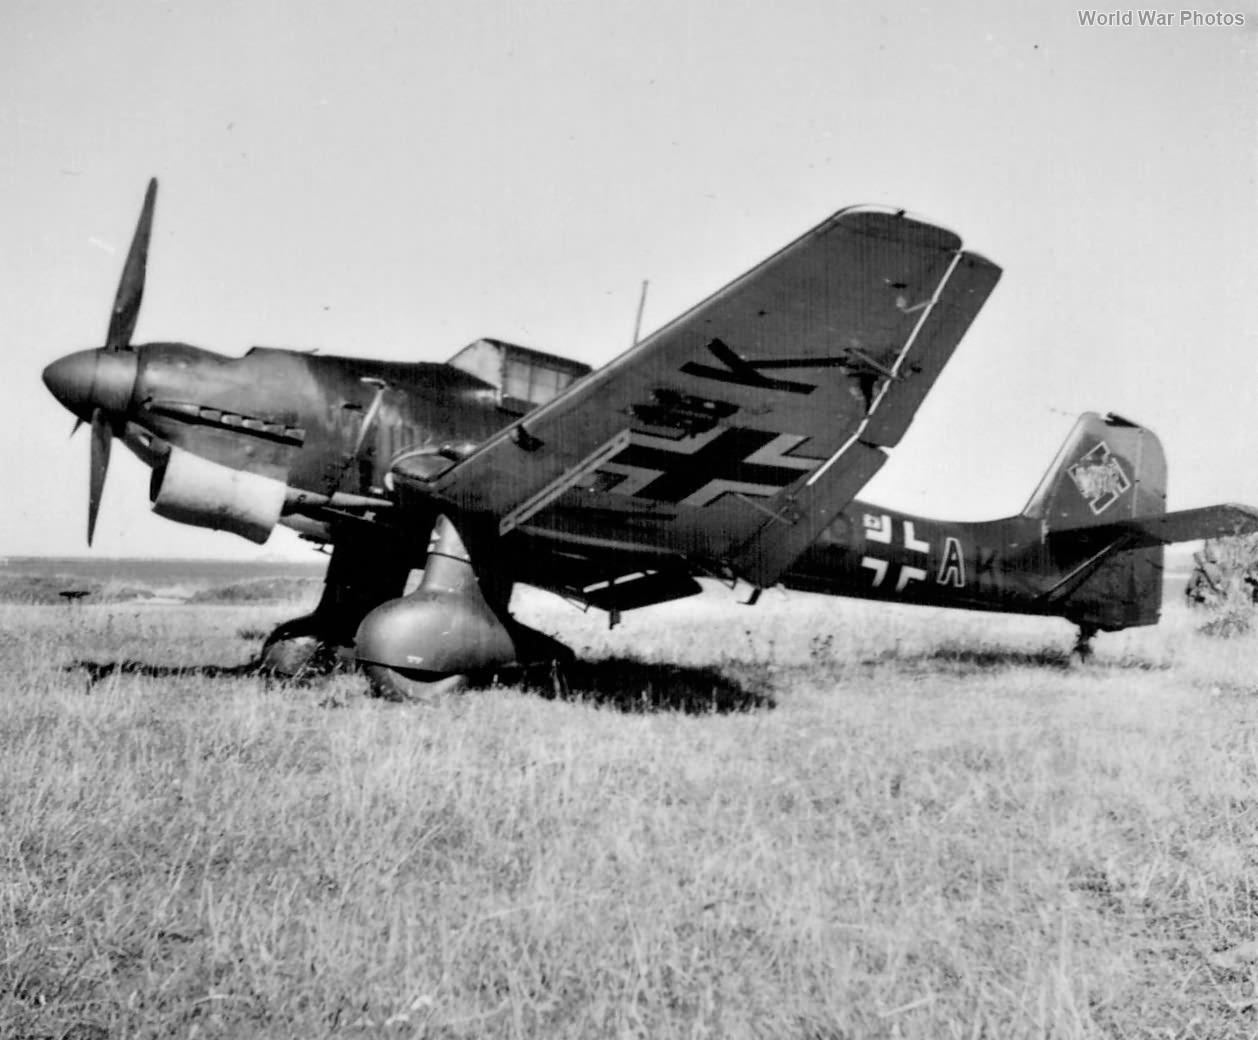 Ju 87 Cherbourg 1940